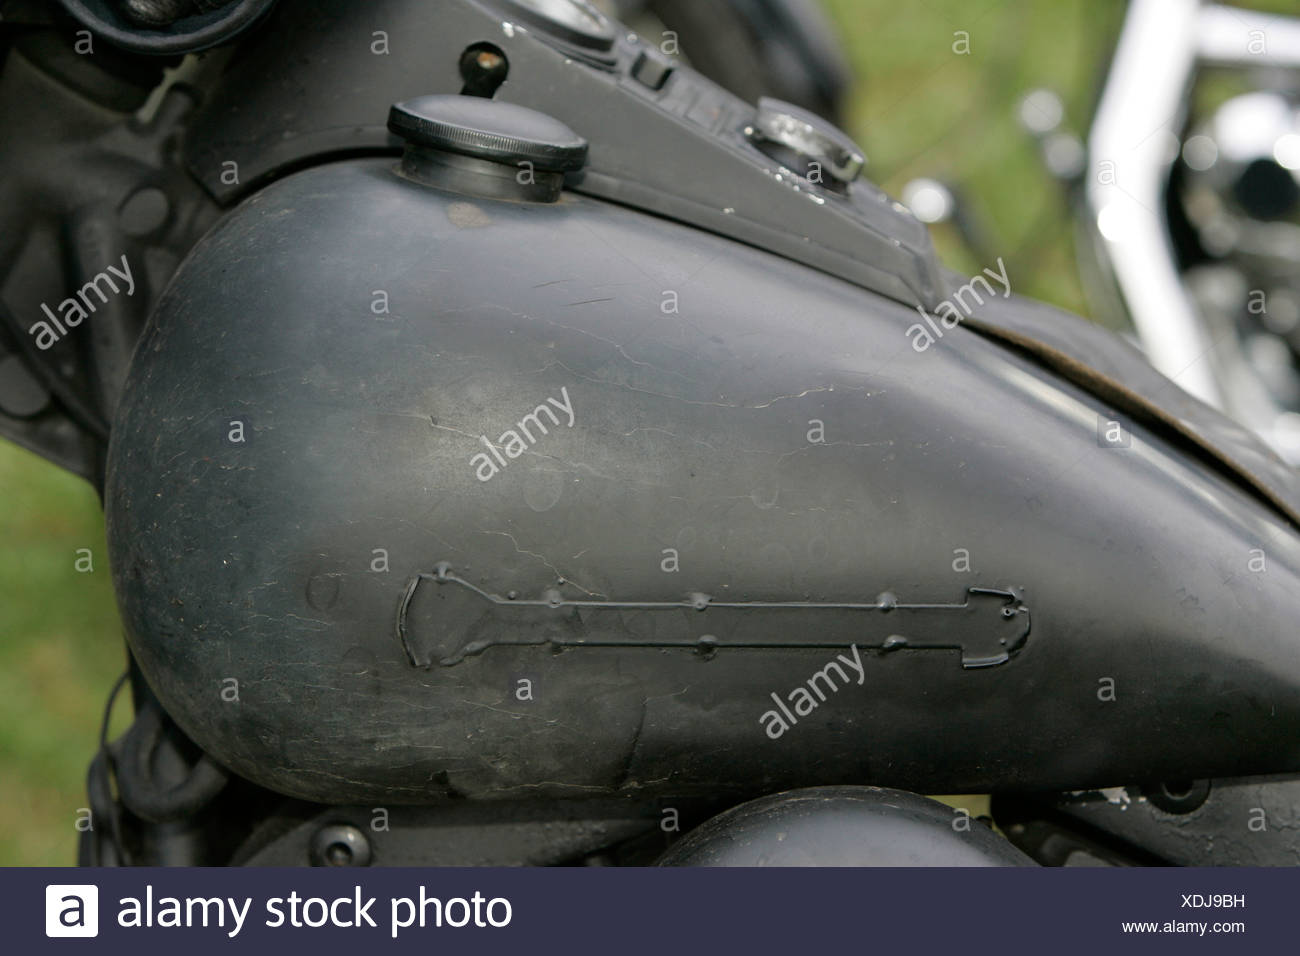 Harley Davidson, Gasolinetank, detail. Stock Photo